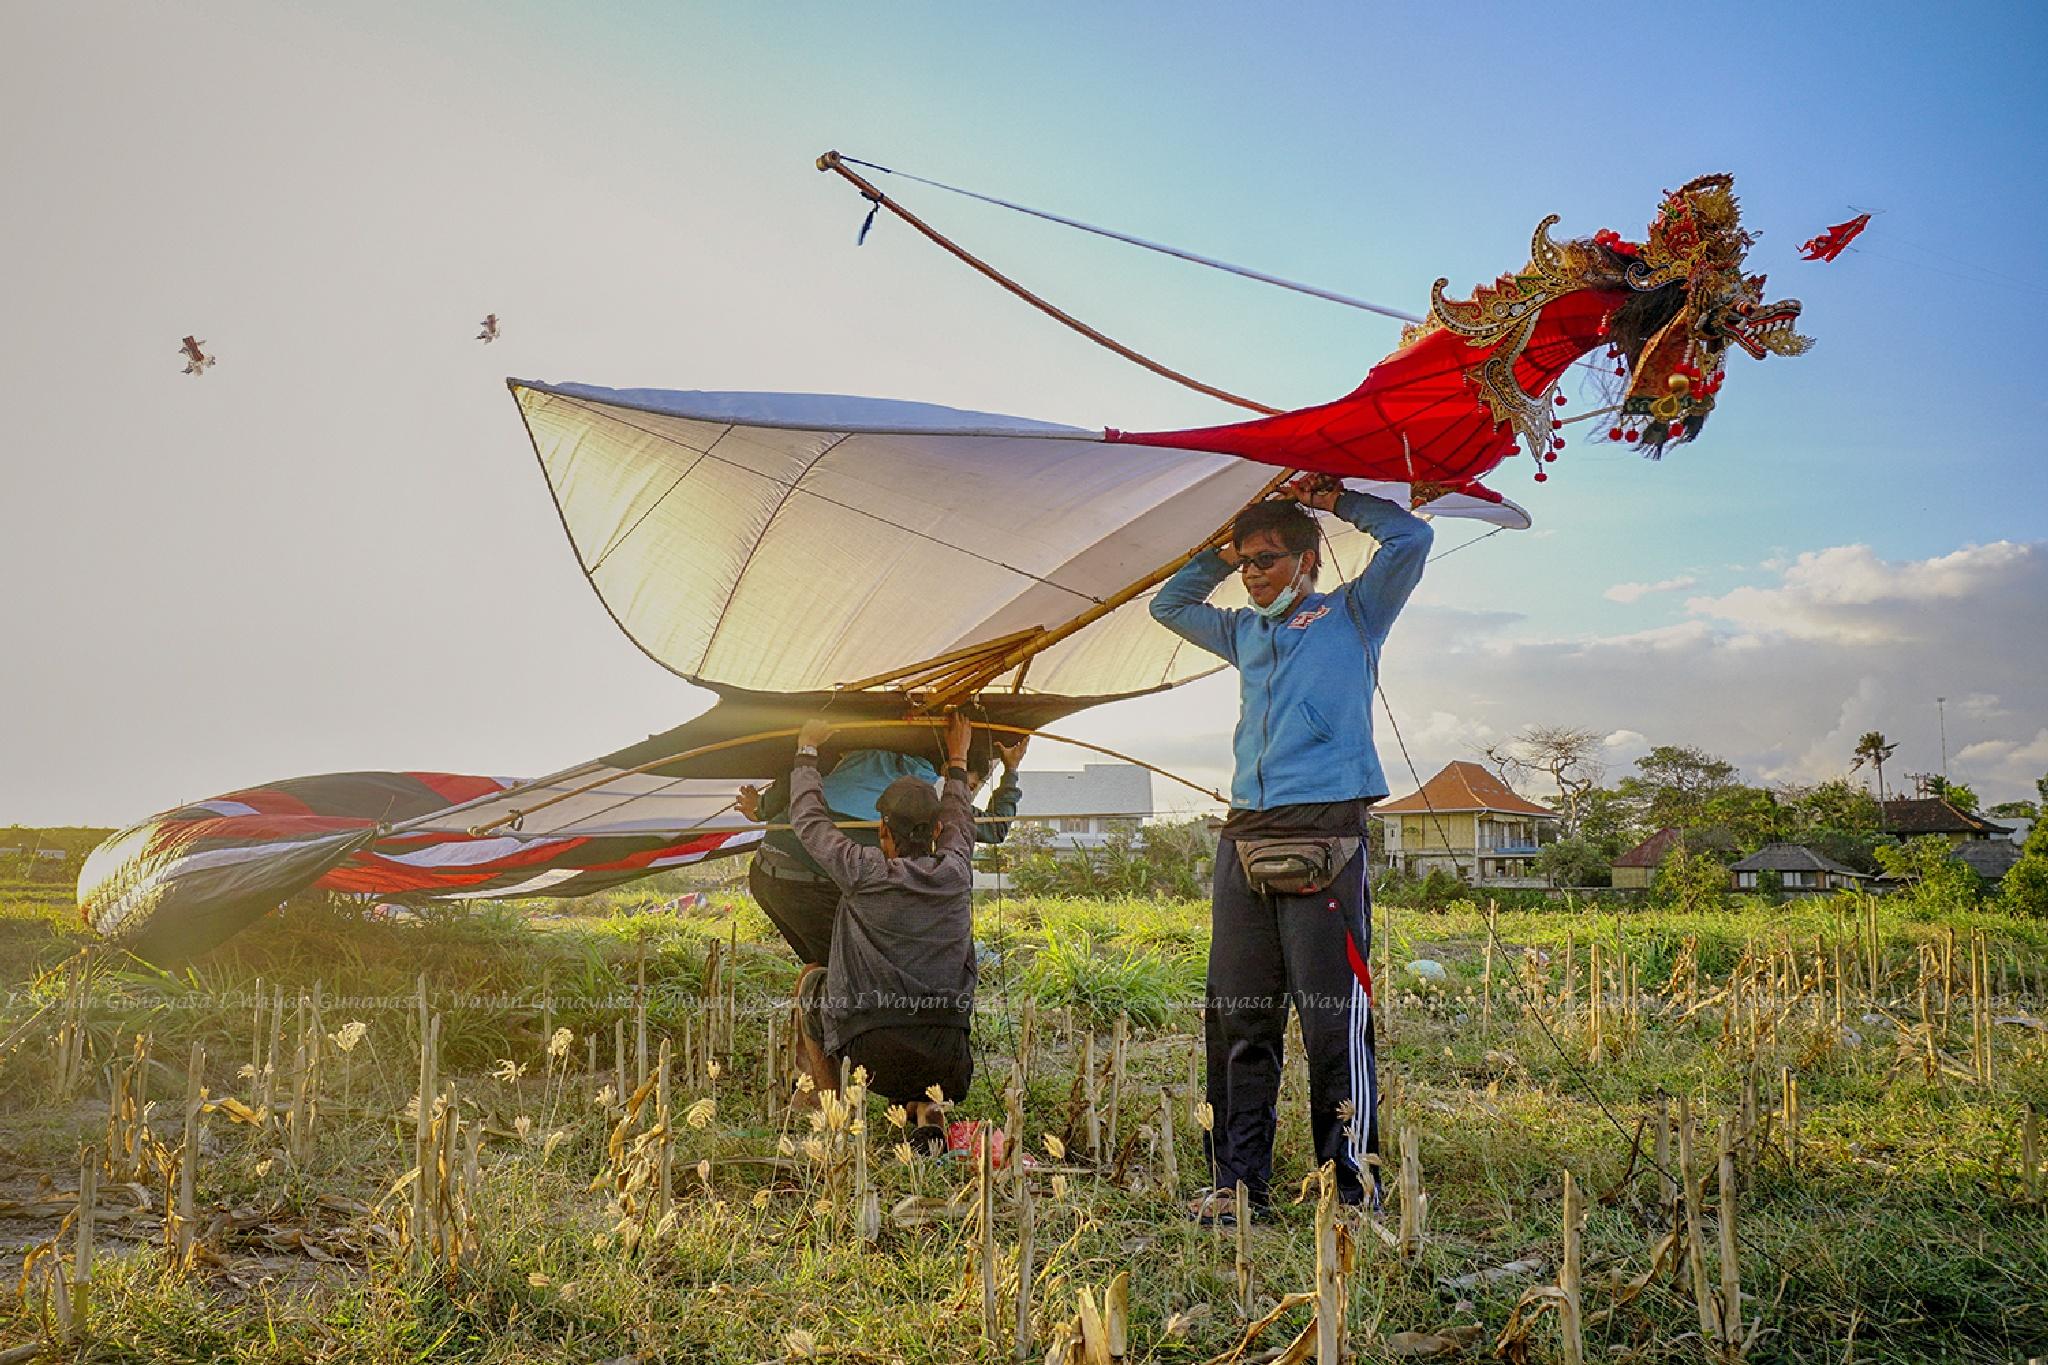 Big kite by yangunayasa63